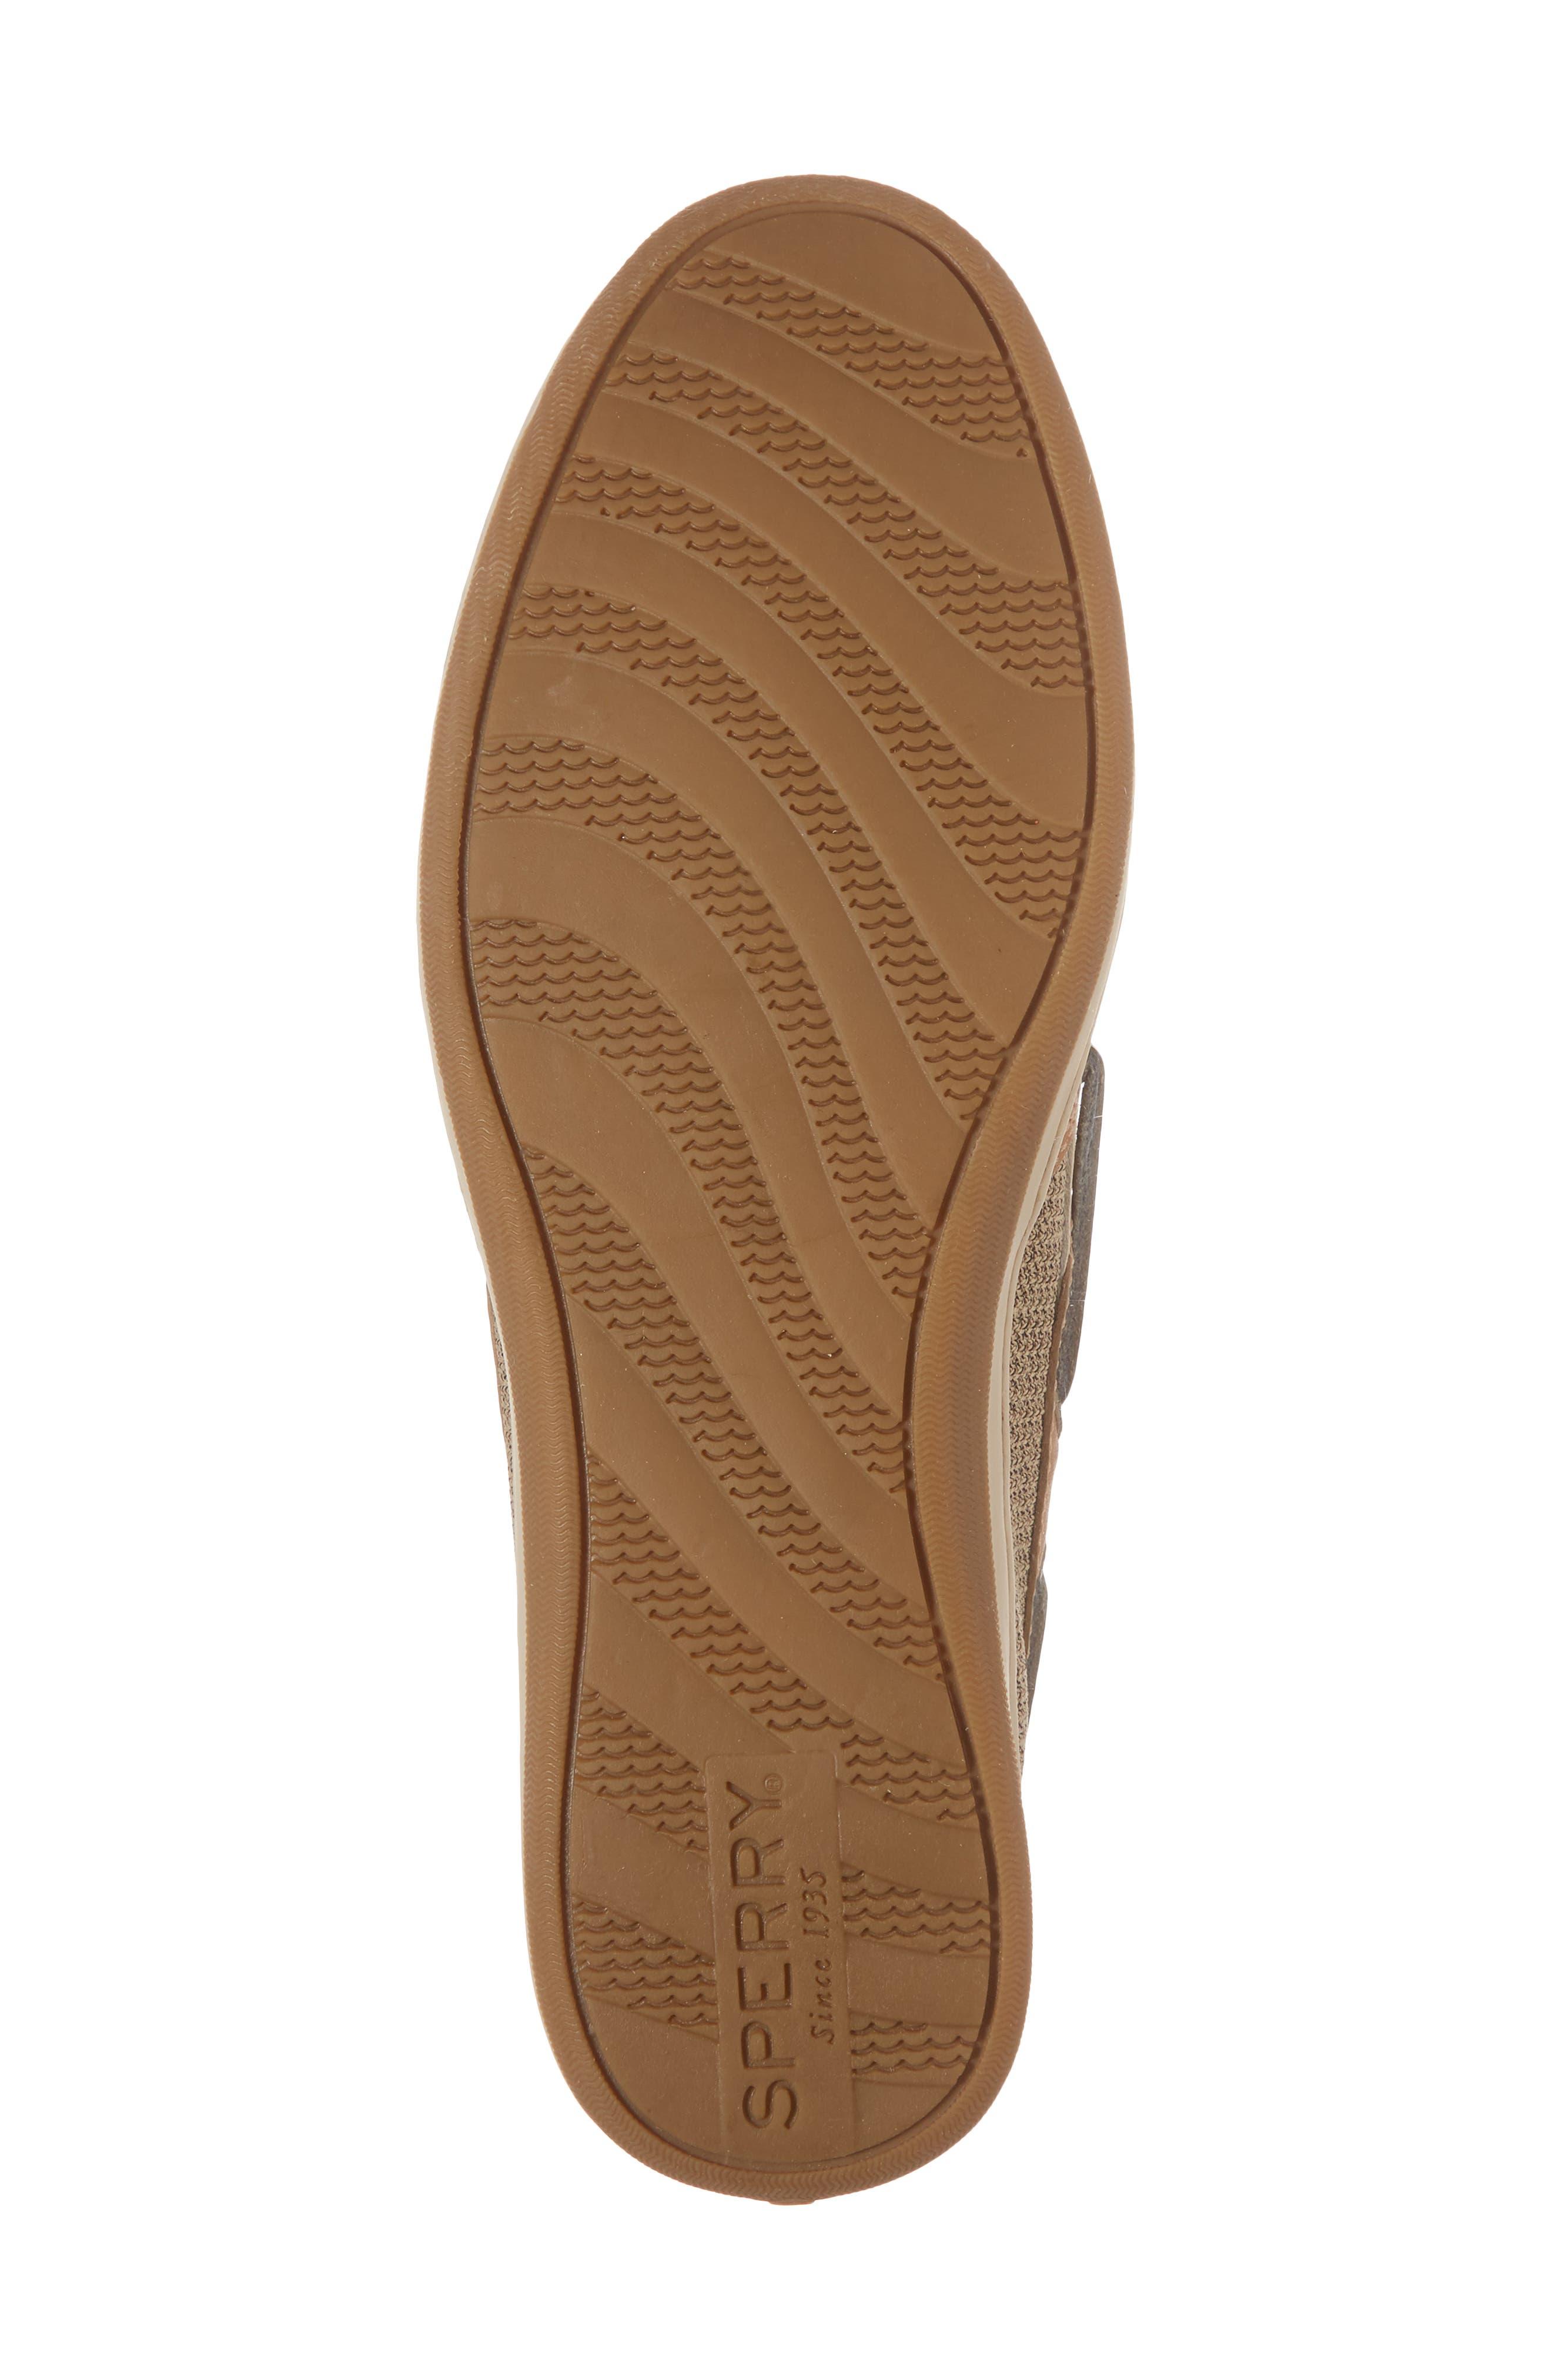 Top-Sider Koifish Loafer,                             Alternate thumbnail 6, color,                             Linen Oat Leather